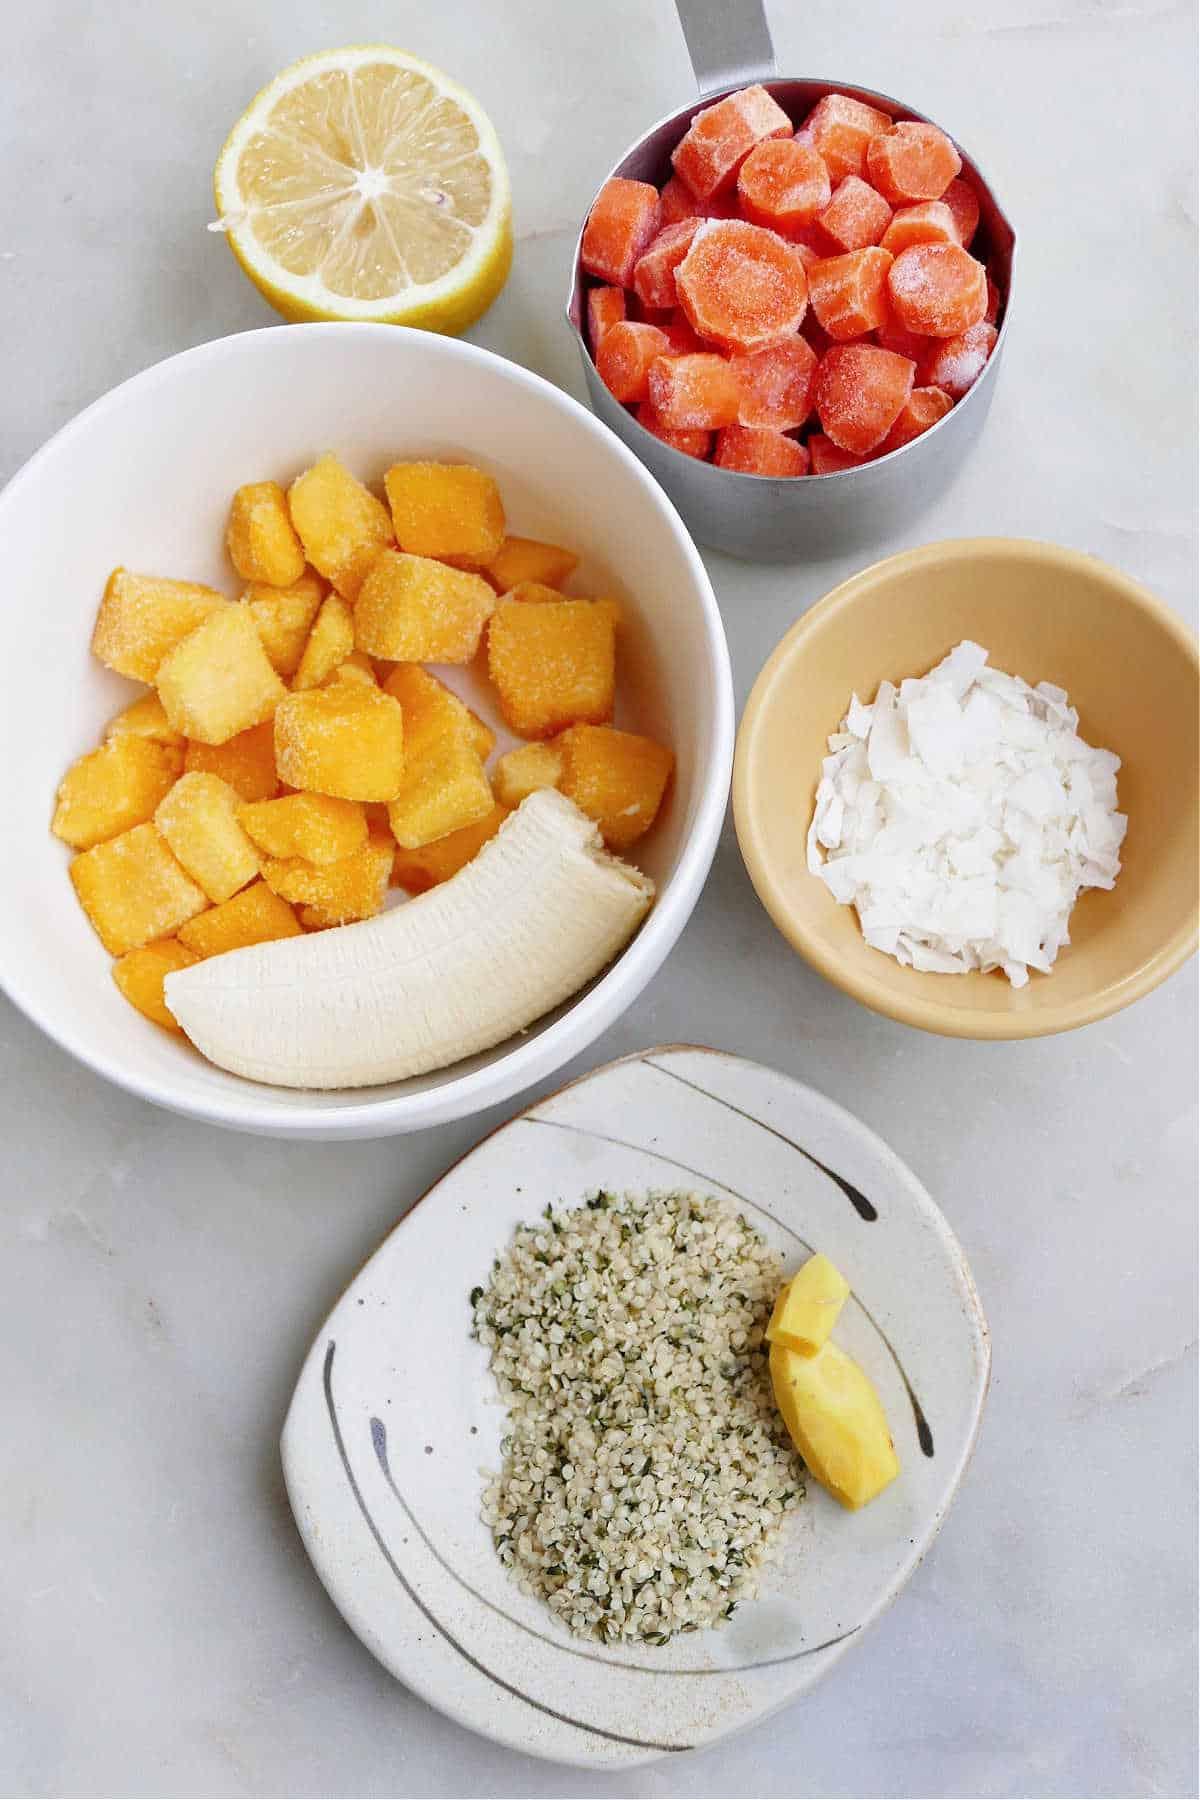 frozen carrots, mango, banana, hemp hearts, ginger, half a lemon, and coconut on a counter